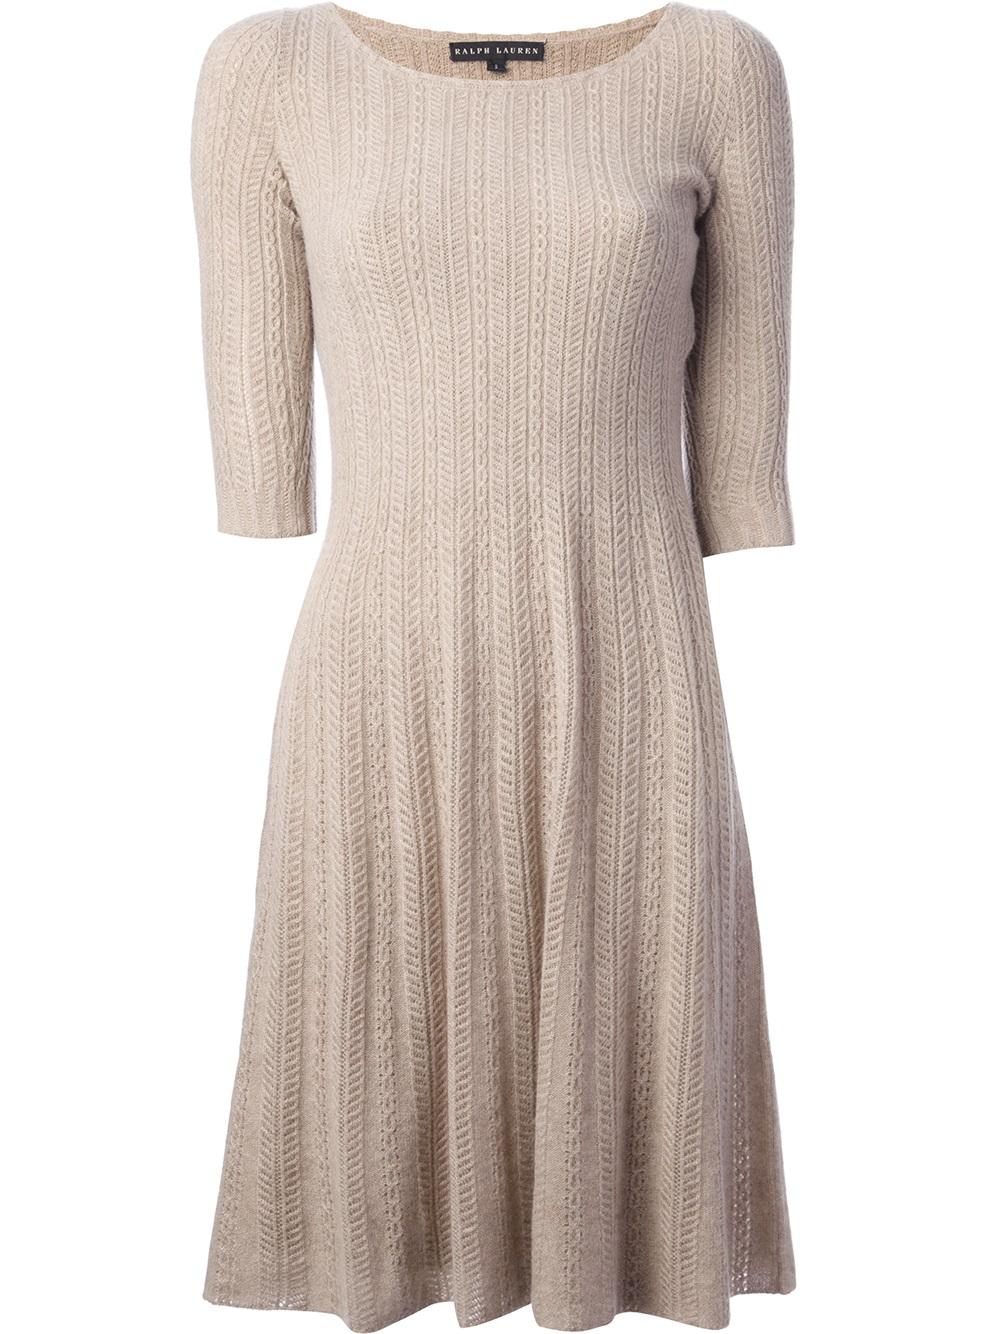 Ralph Lauren Black Label Cable Knit Dress in Beige (nude